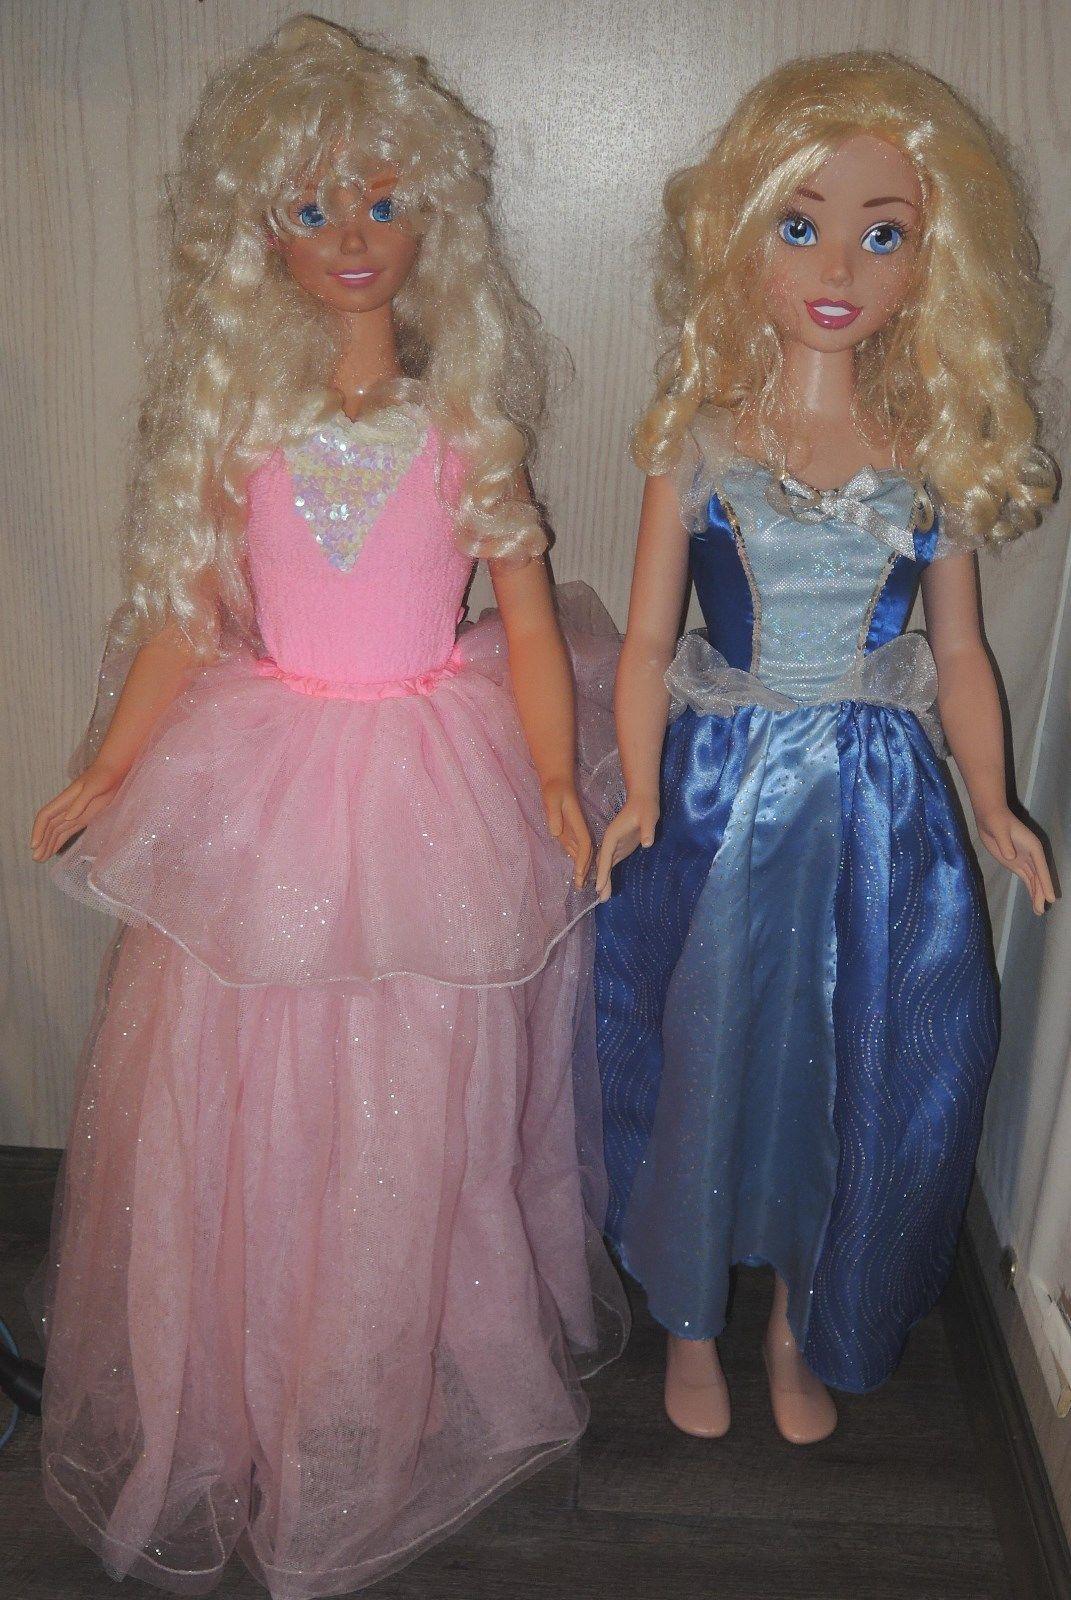 Sale Lot Disney Frozen Elsa My Life Size Barbie Dolls 38 Tall W